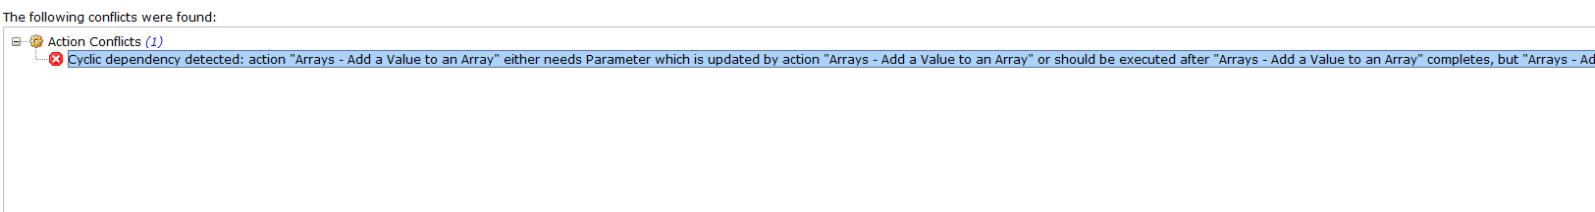 ArrayCD.png